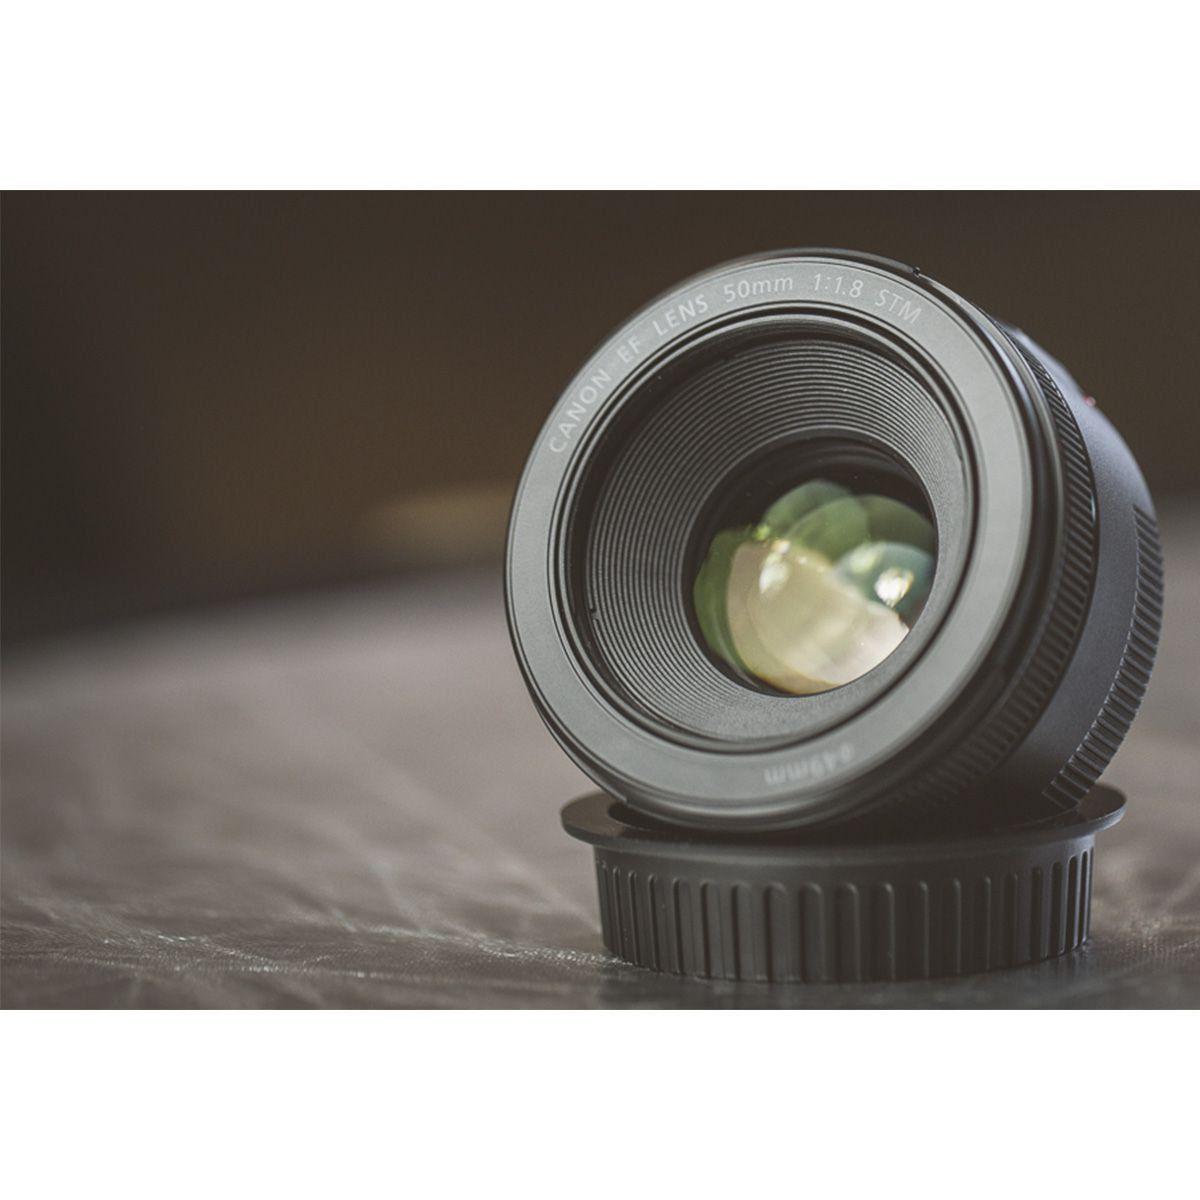 Canon Lente EF 50mm F/1.8 STM